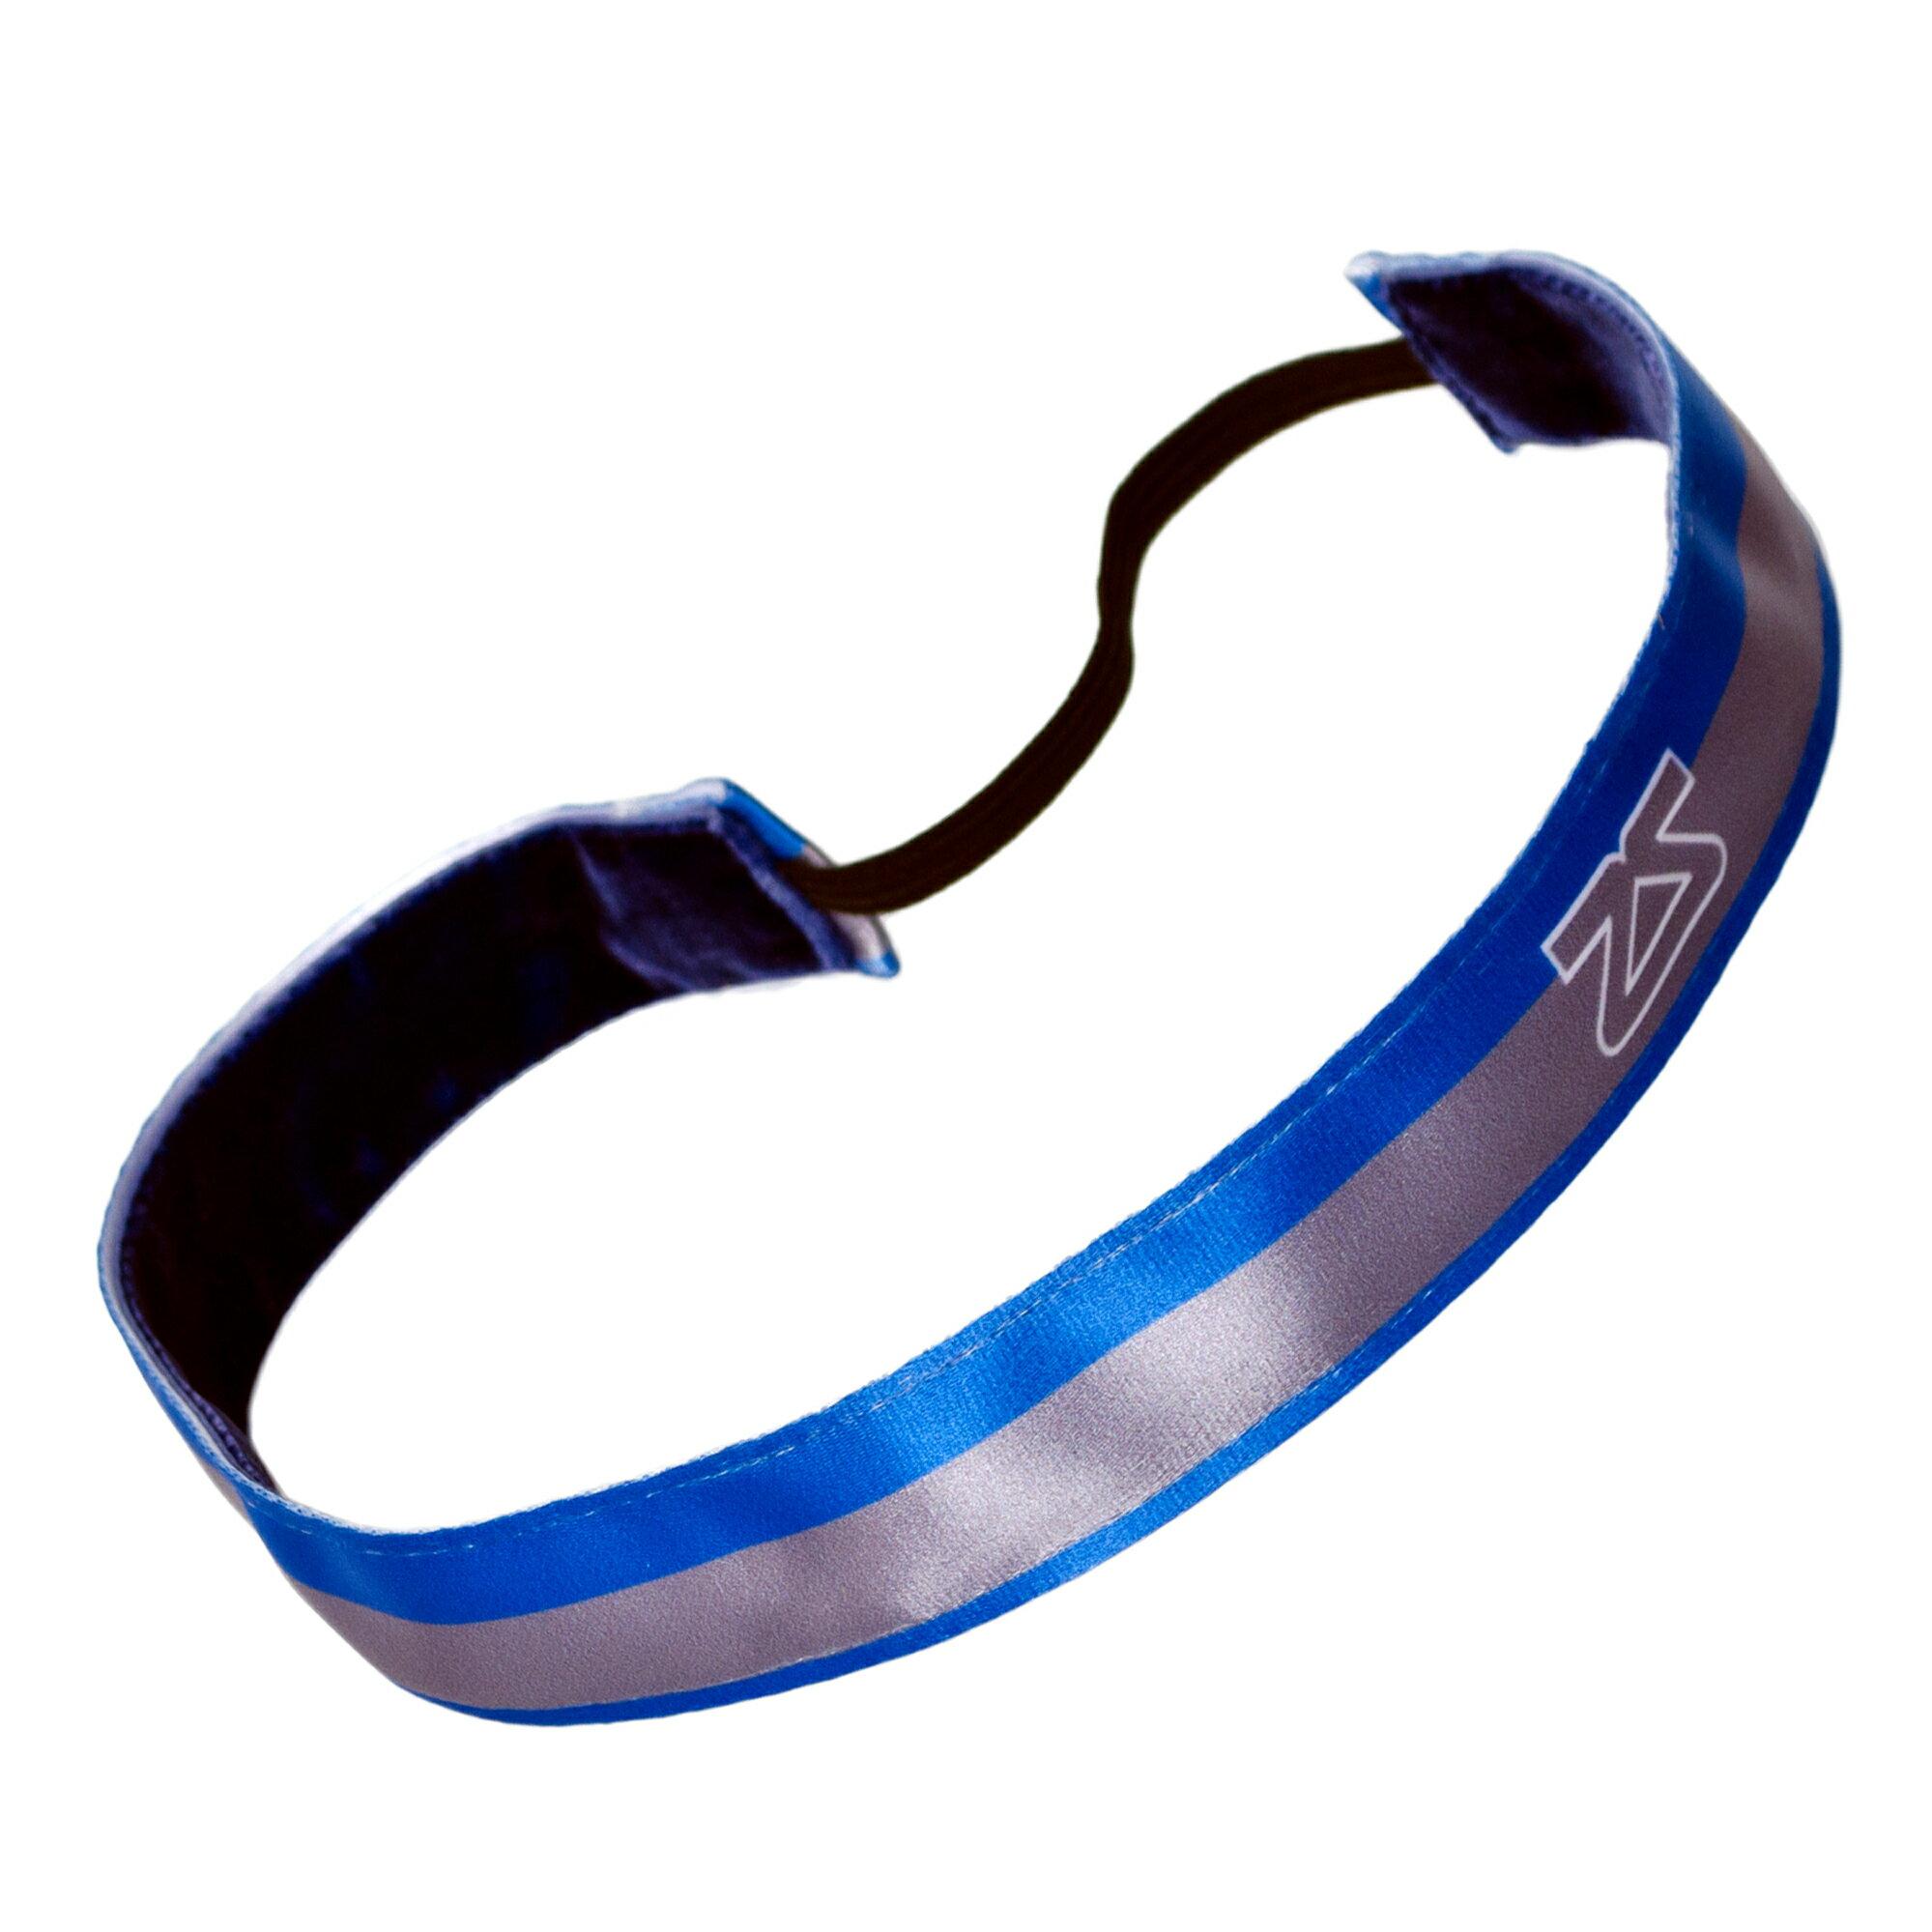 Zensah 防滑運動頭帶 - 銀河冰藍